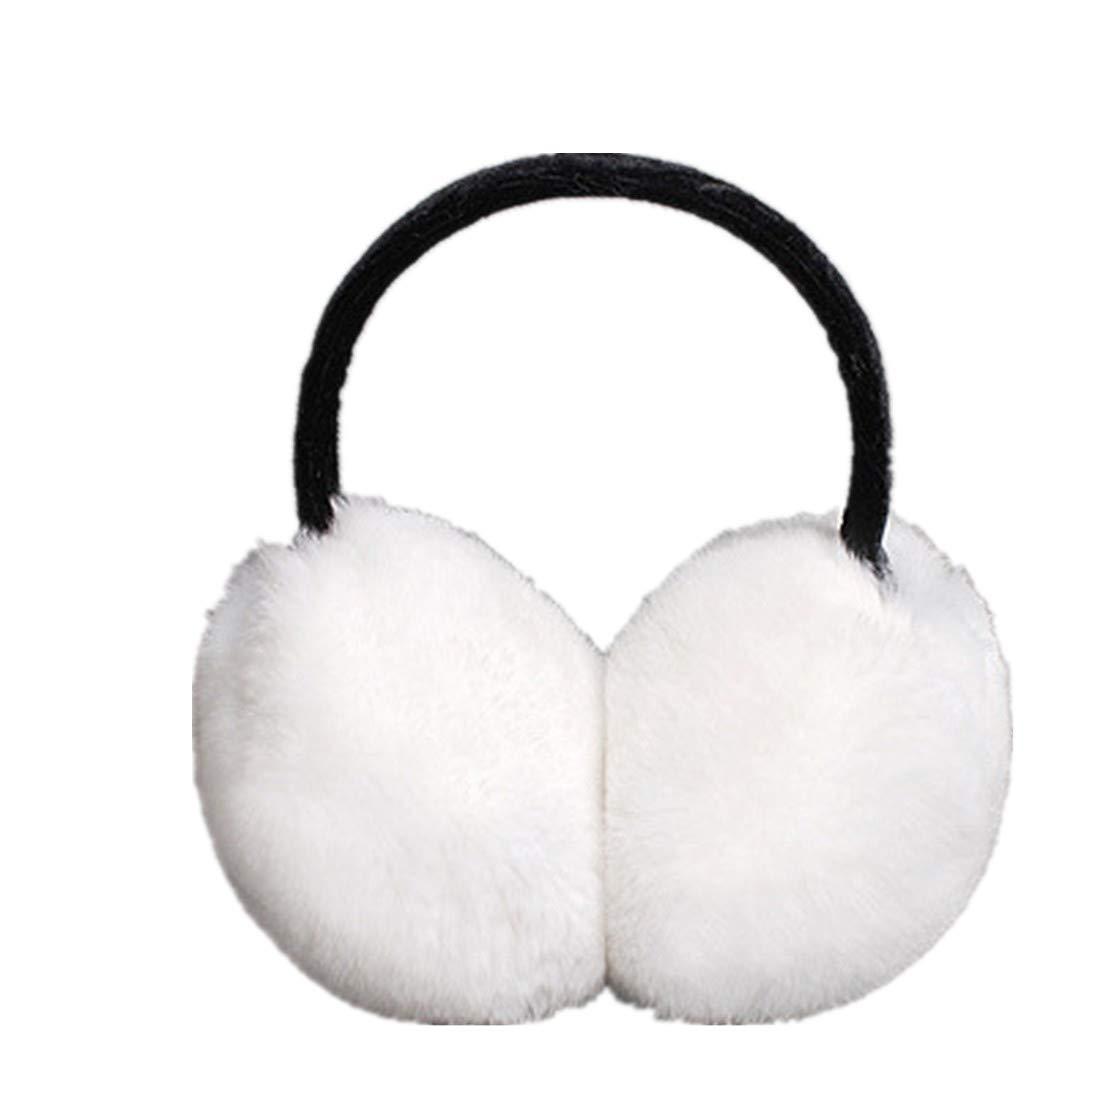 Women Lovely Fur Earmuffs Winter Keep Warm Ear Protector Hair Accessories Gift